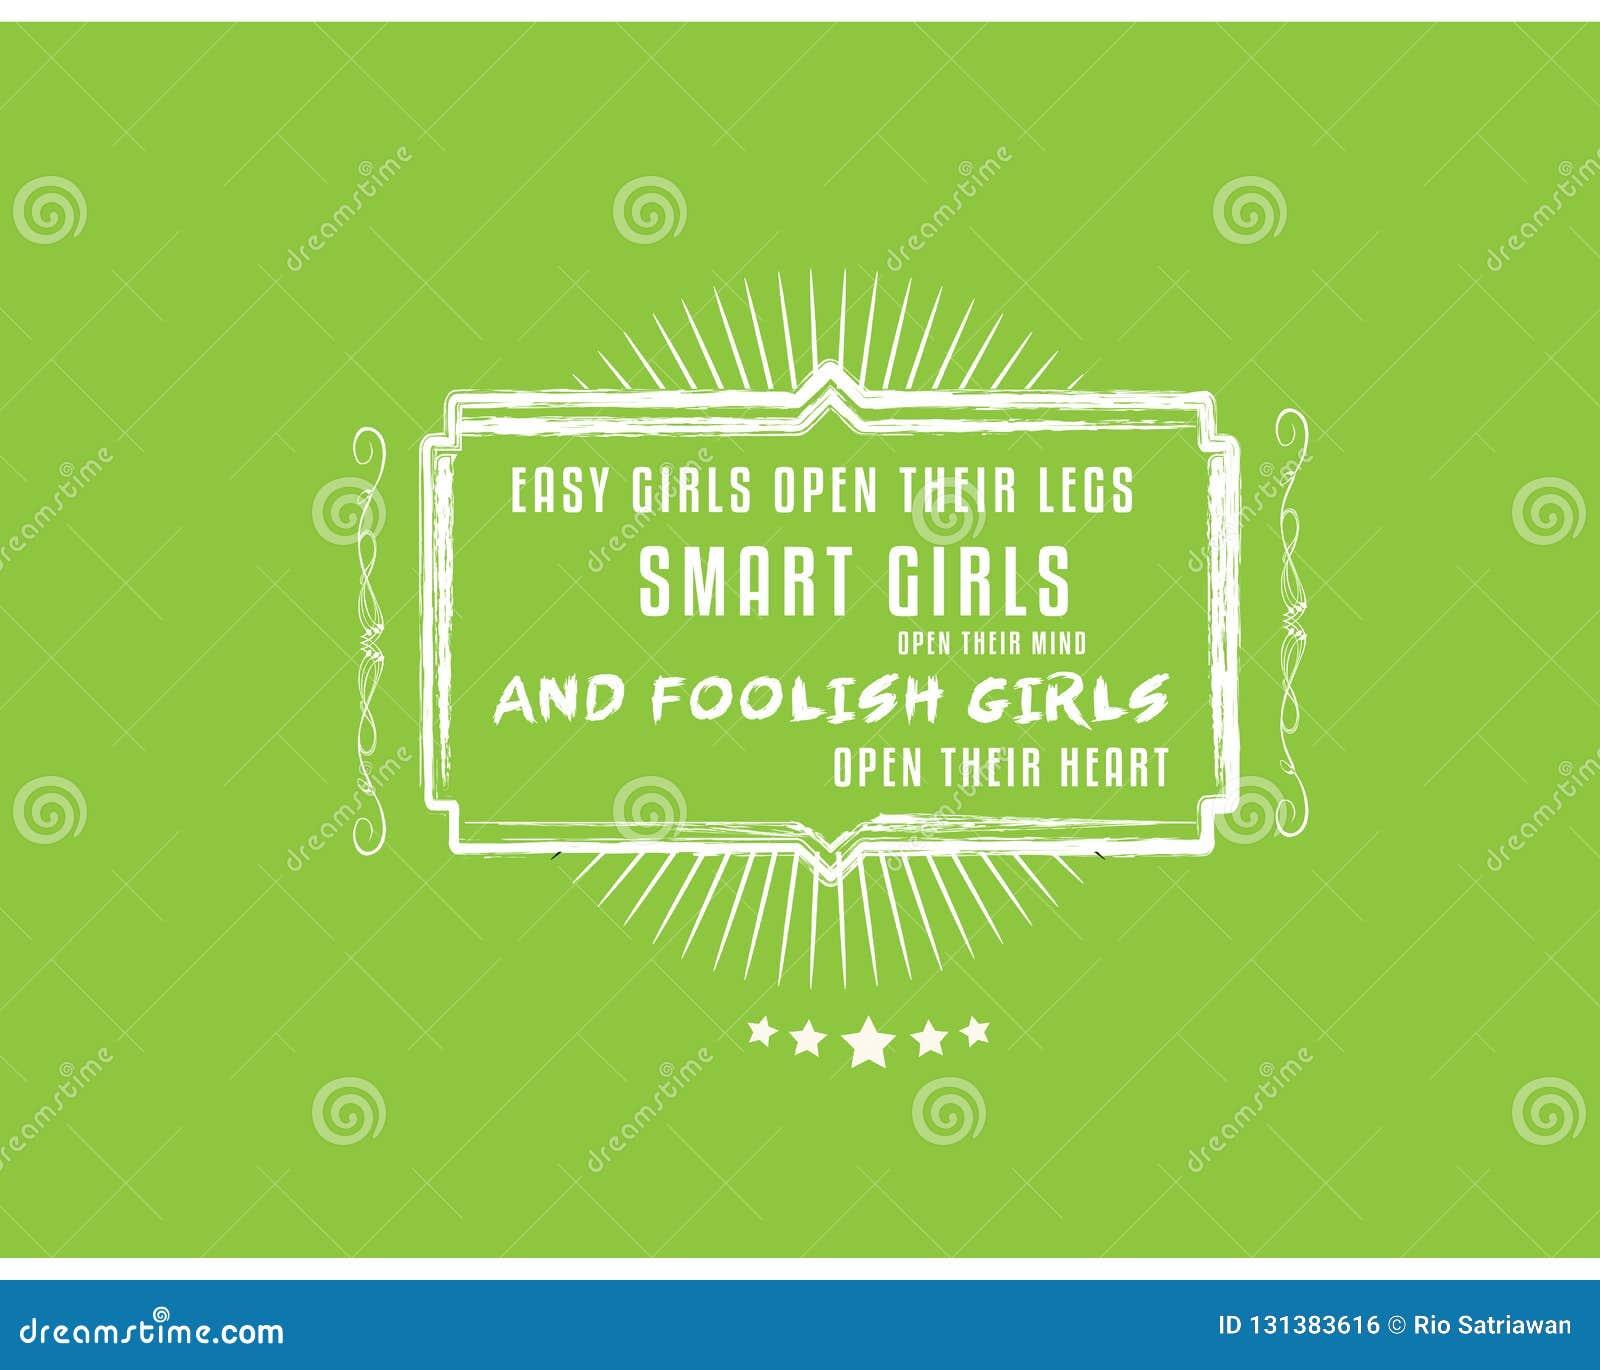 Easy girls open their legs,Smart girls open their mind,and foolish girls open their heart